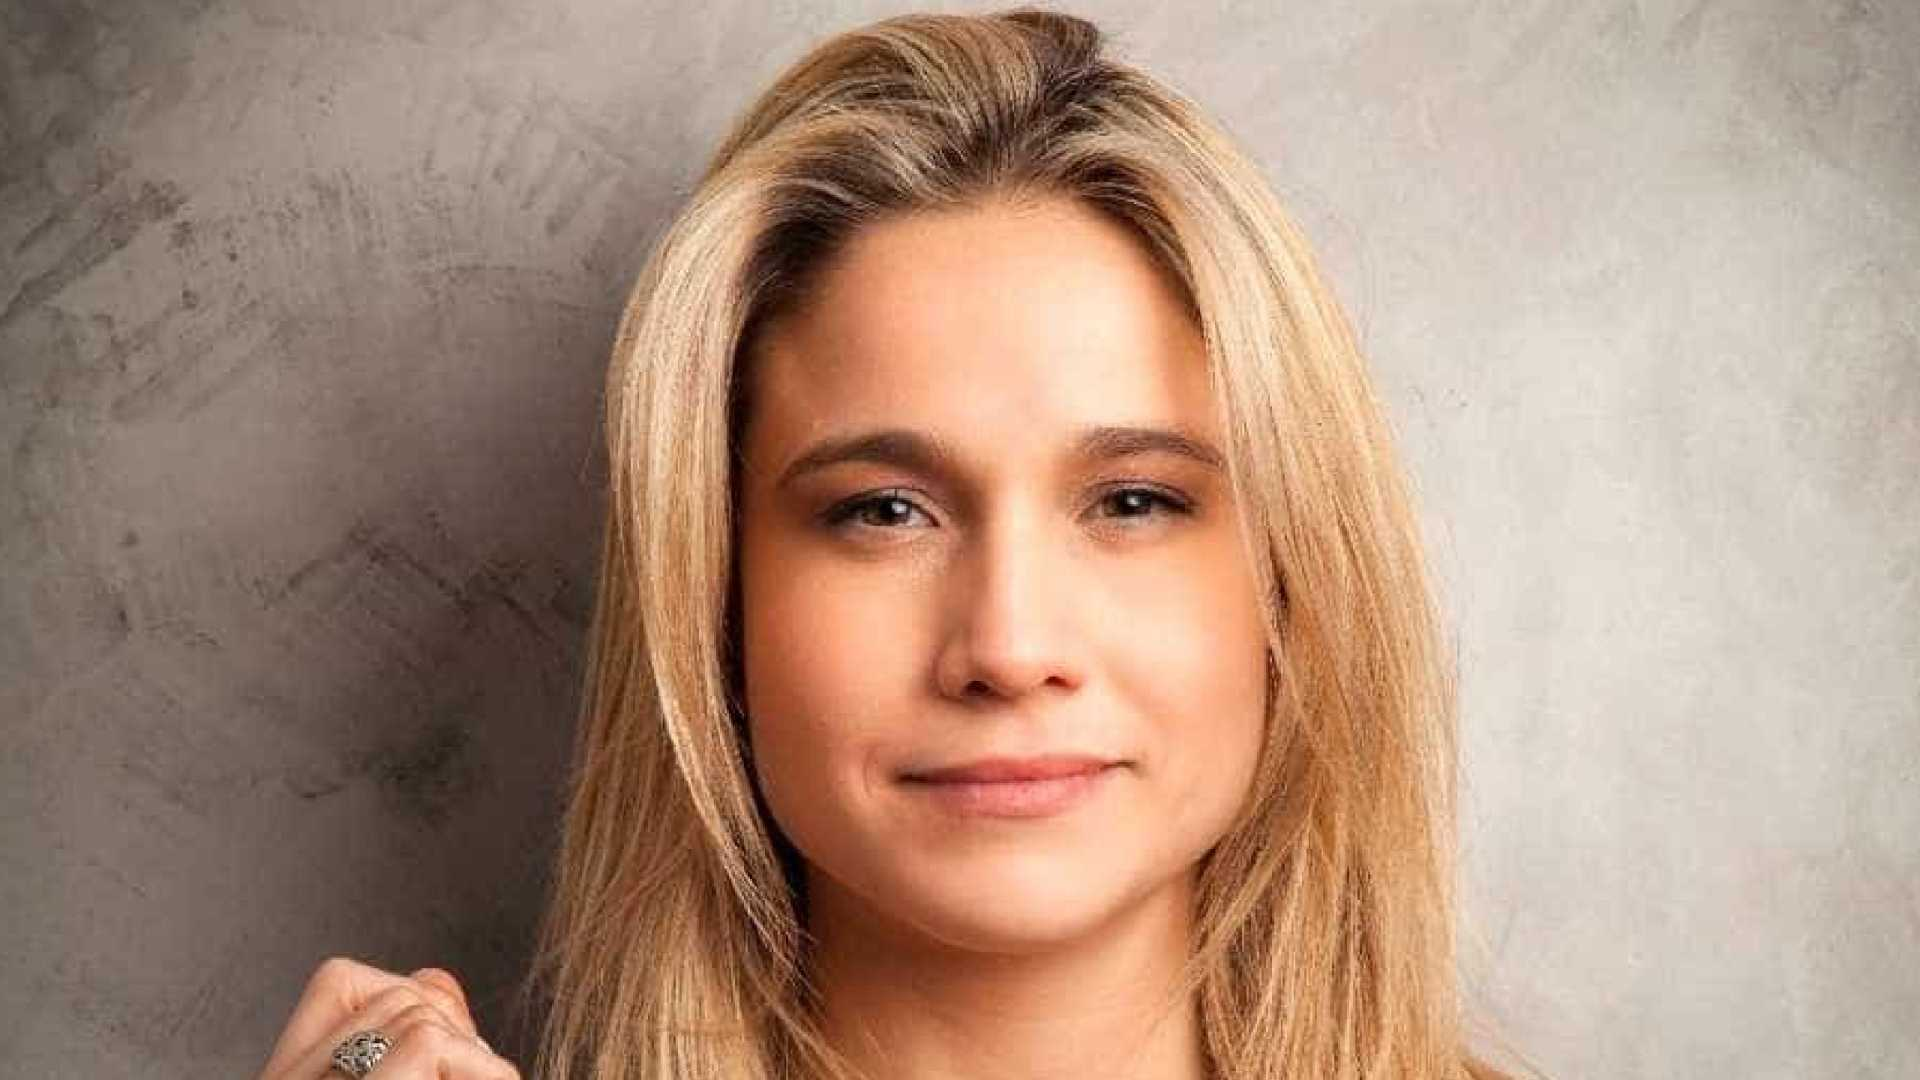 naom 596765395bd59 1 - Fernanda Gentil vai deixar jornalismo da TV Globo